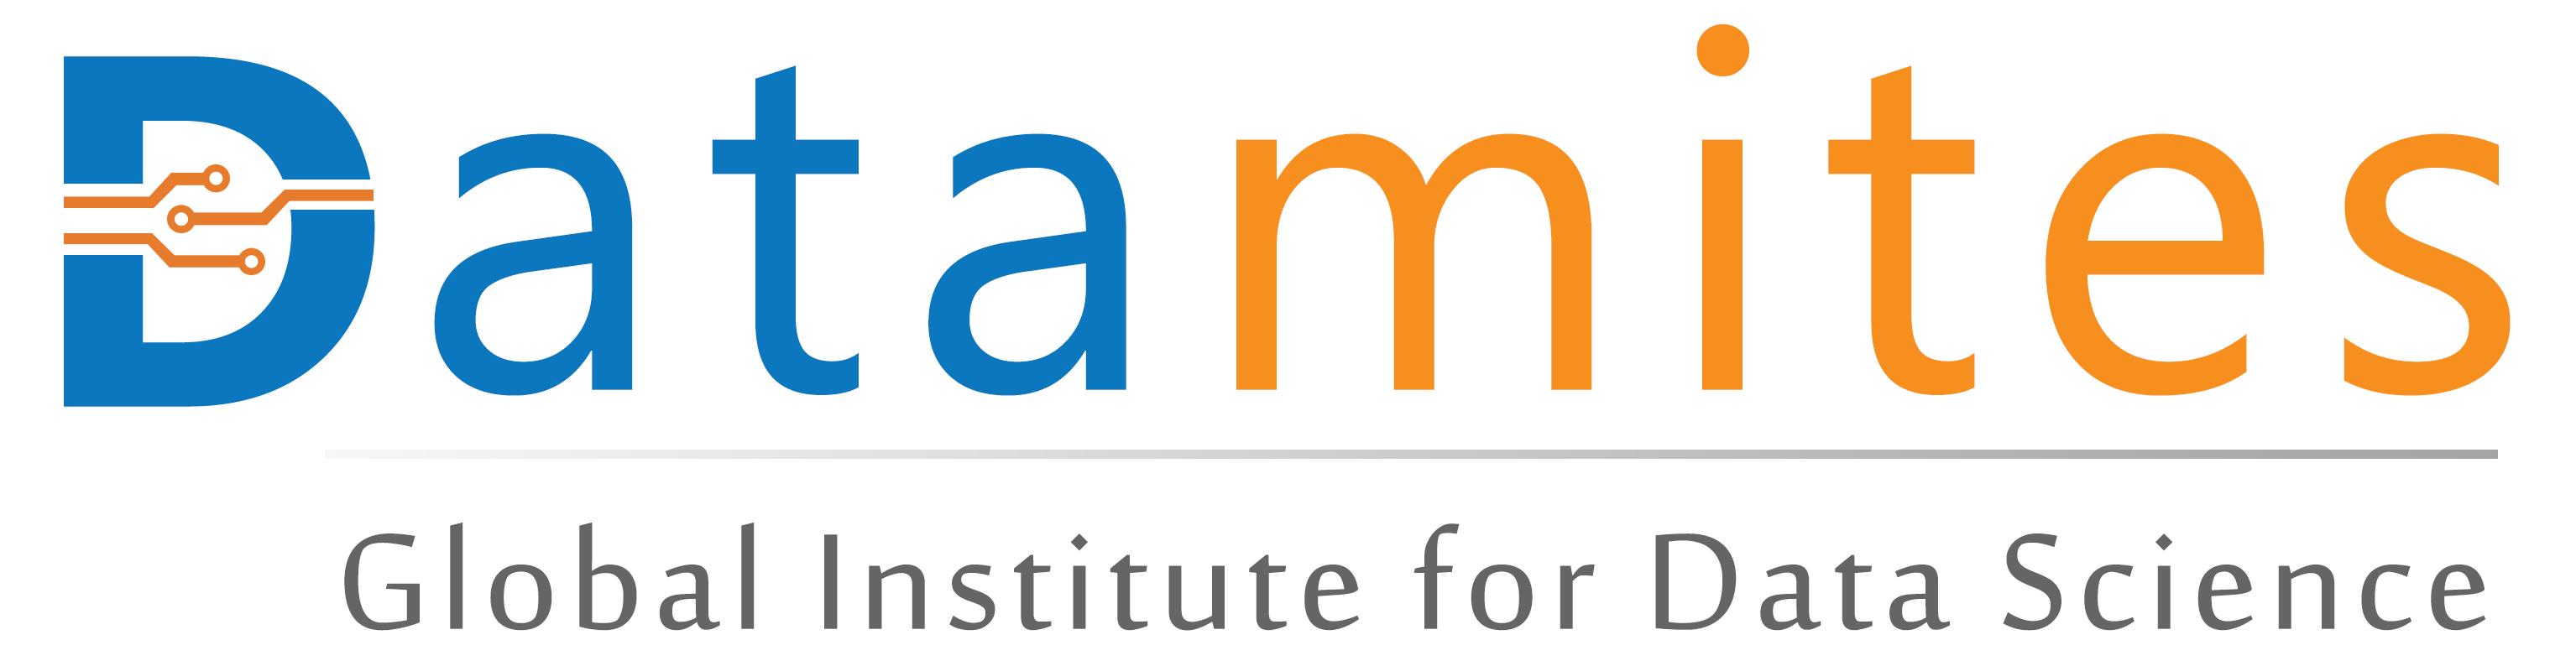 File:Datamites logo.jpg - Wikimedia Commons